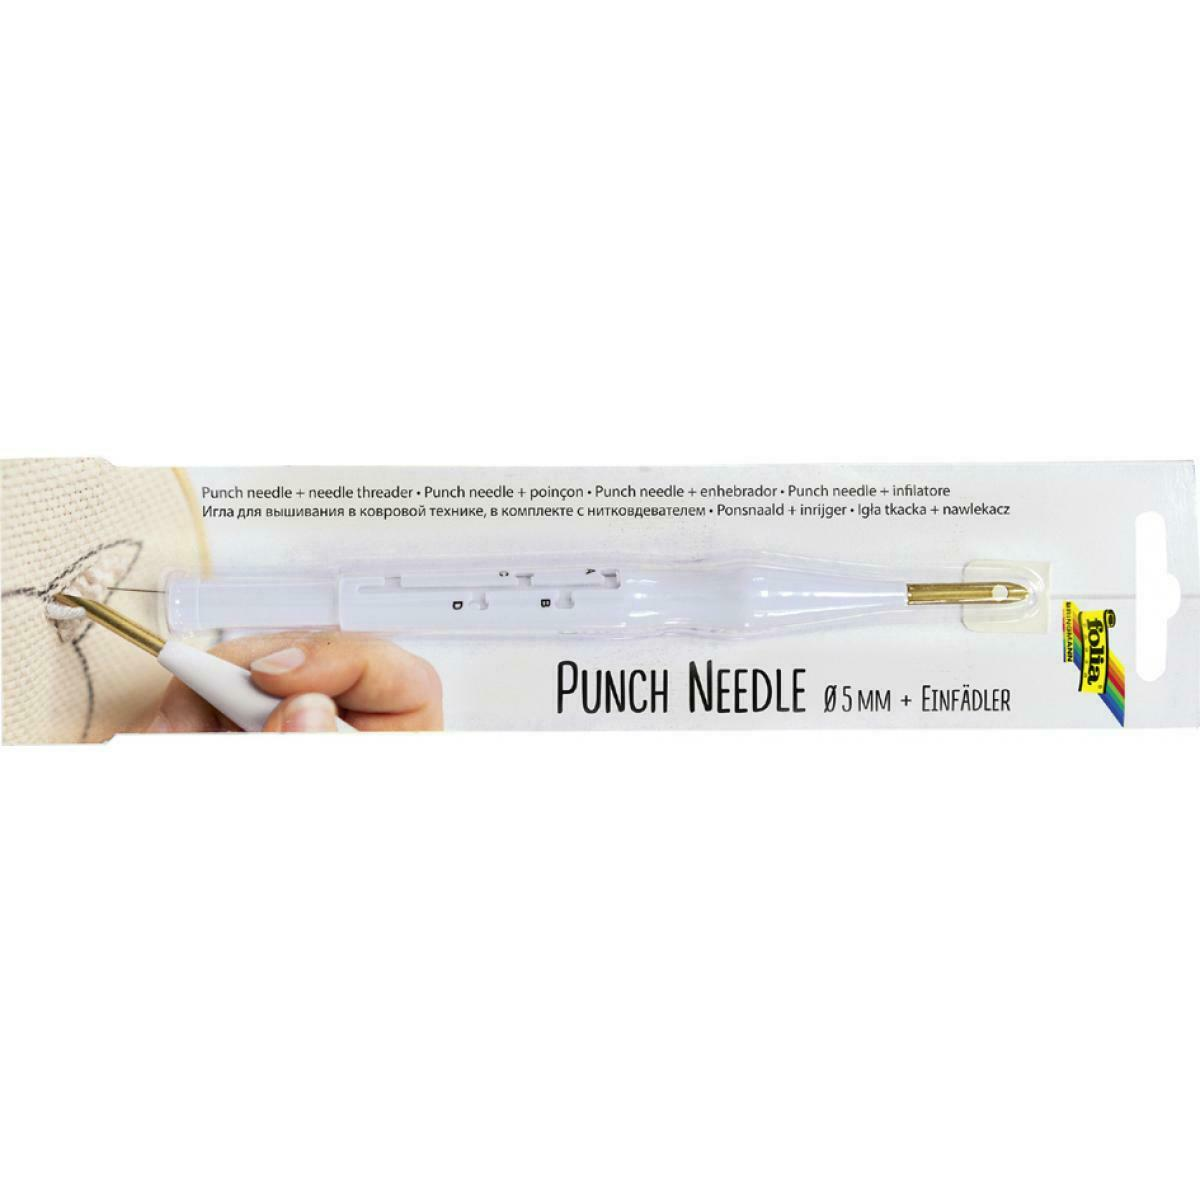 folia Punch Needle incl. Einfädler Punchnadel inkl. Einfädelhilfe, verstellbar 23410